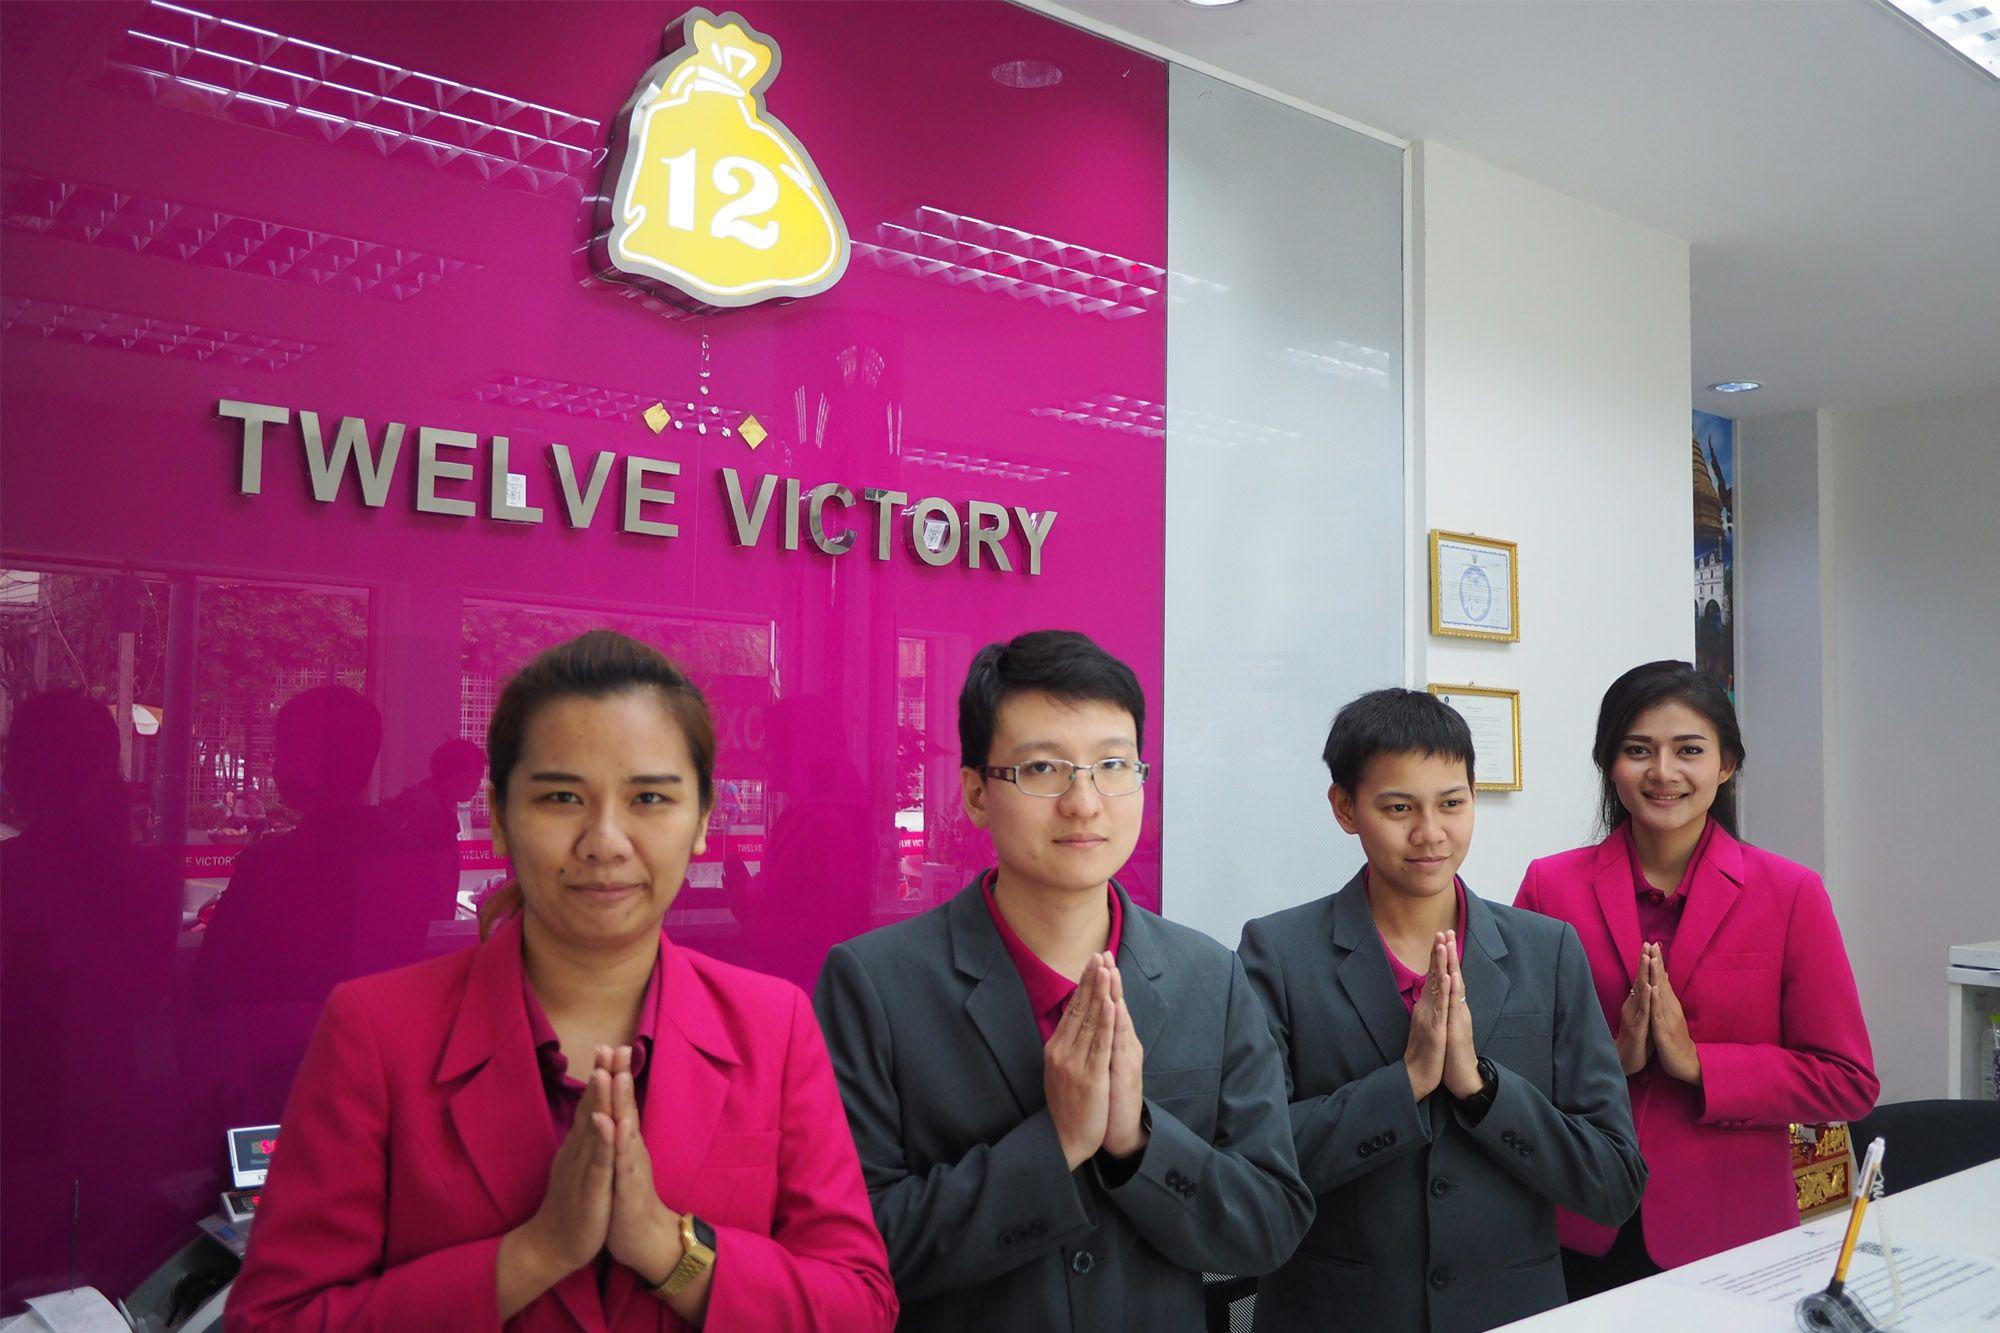 Twelve Victory Exchange Co.,Ltd 拾貳永勝交換有限公司